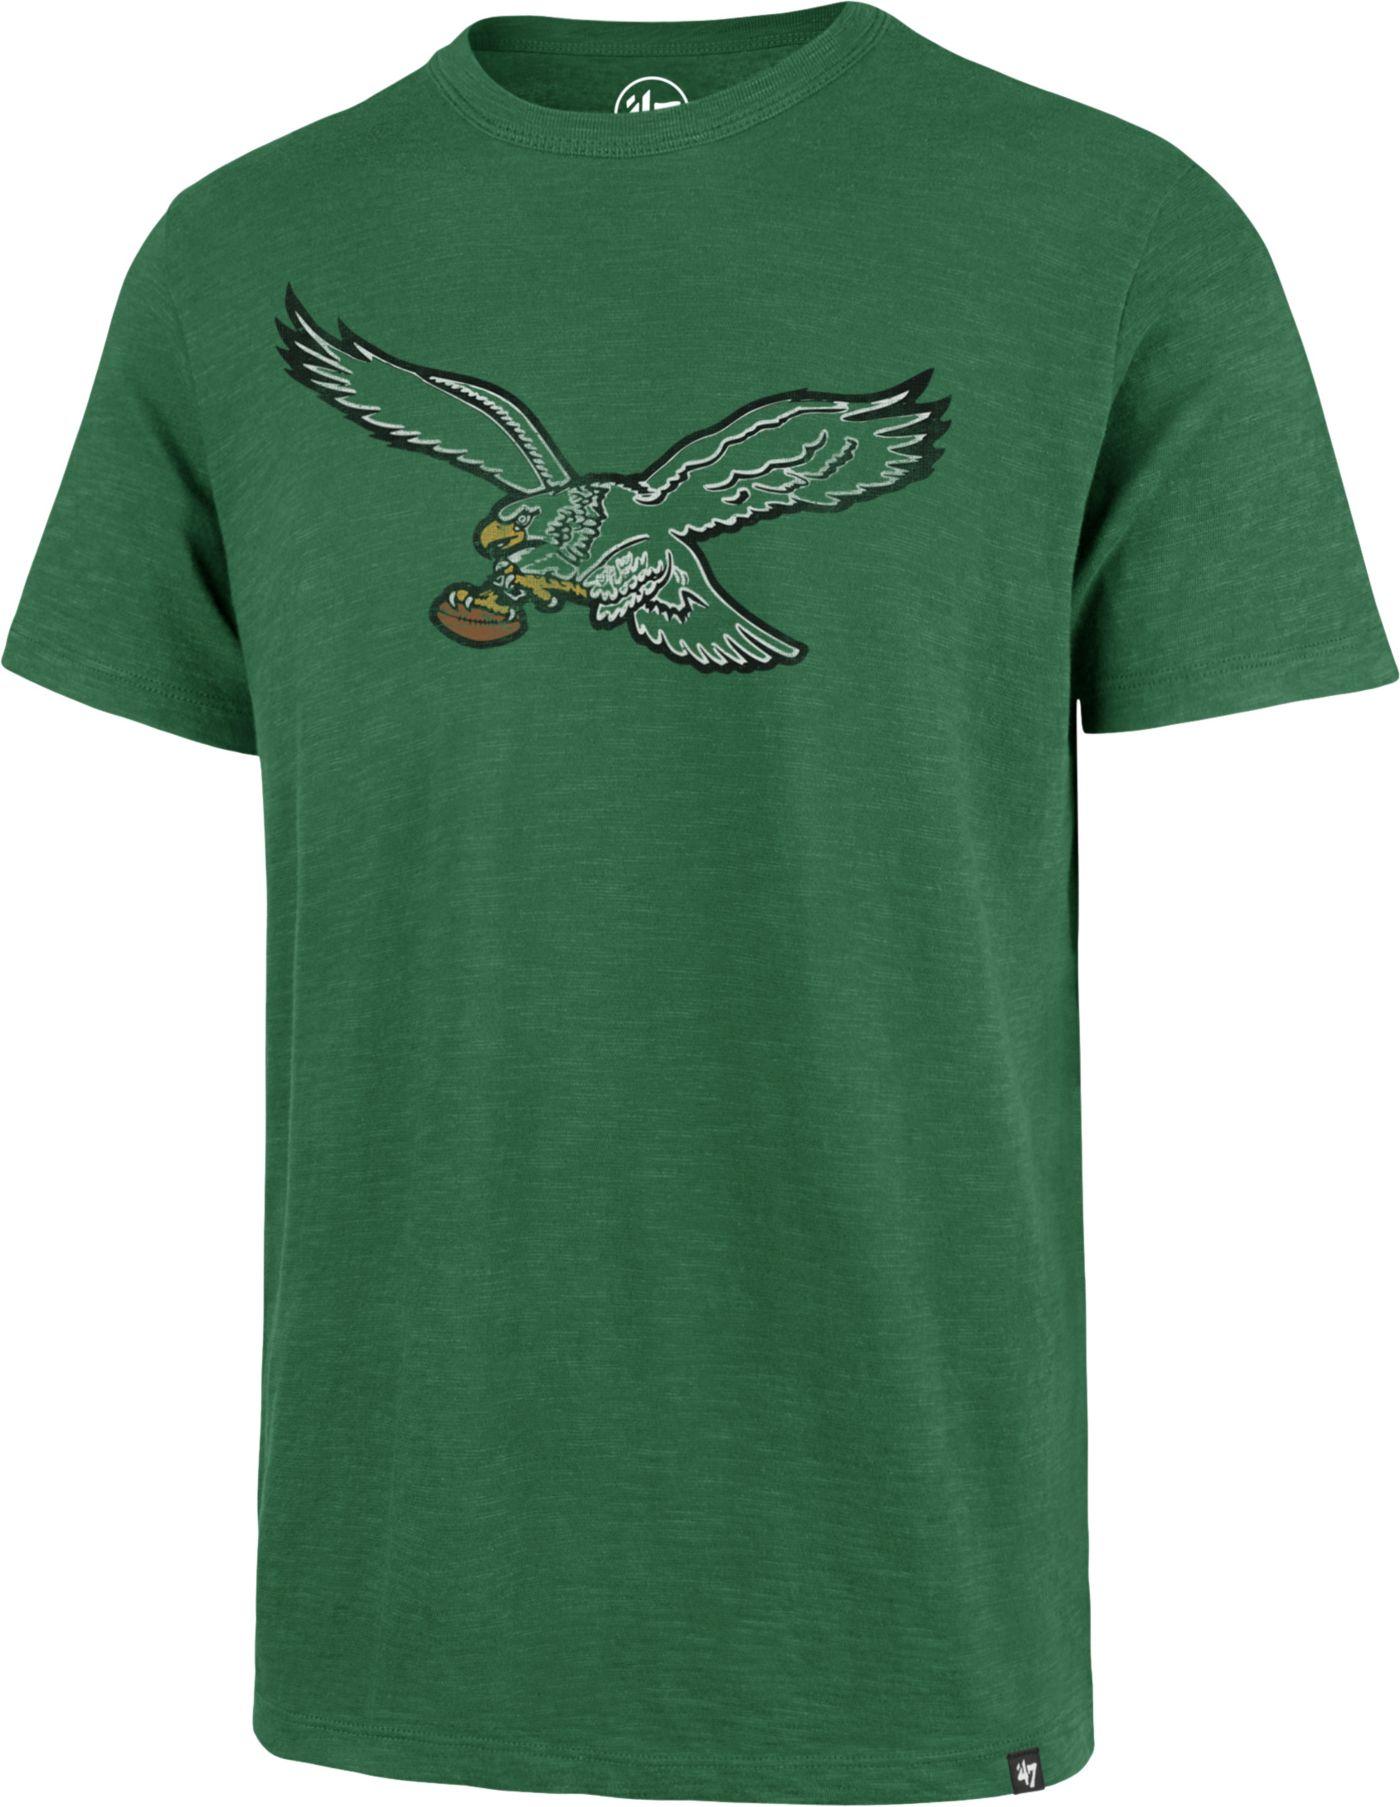 '47 Men's Philadelphia Eagles Scrum Logo Legacy Green T-Shirt